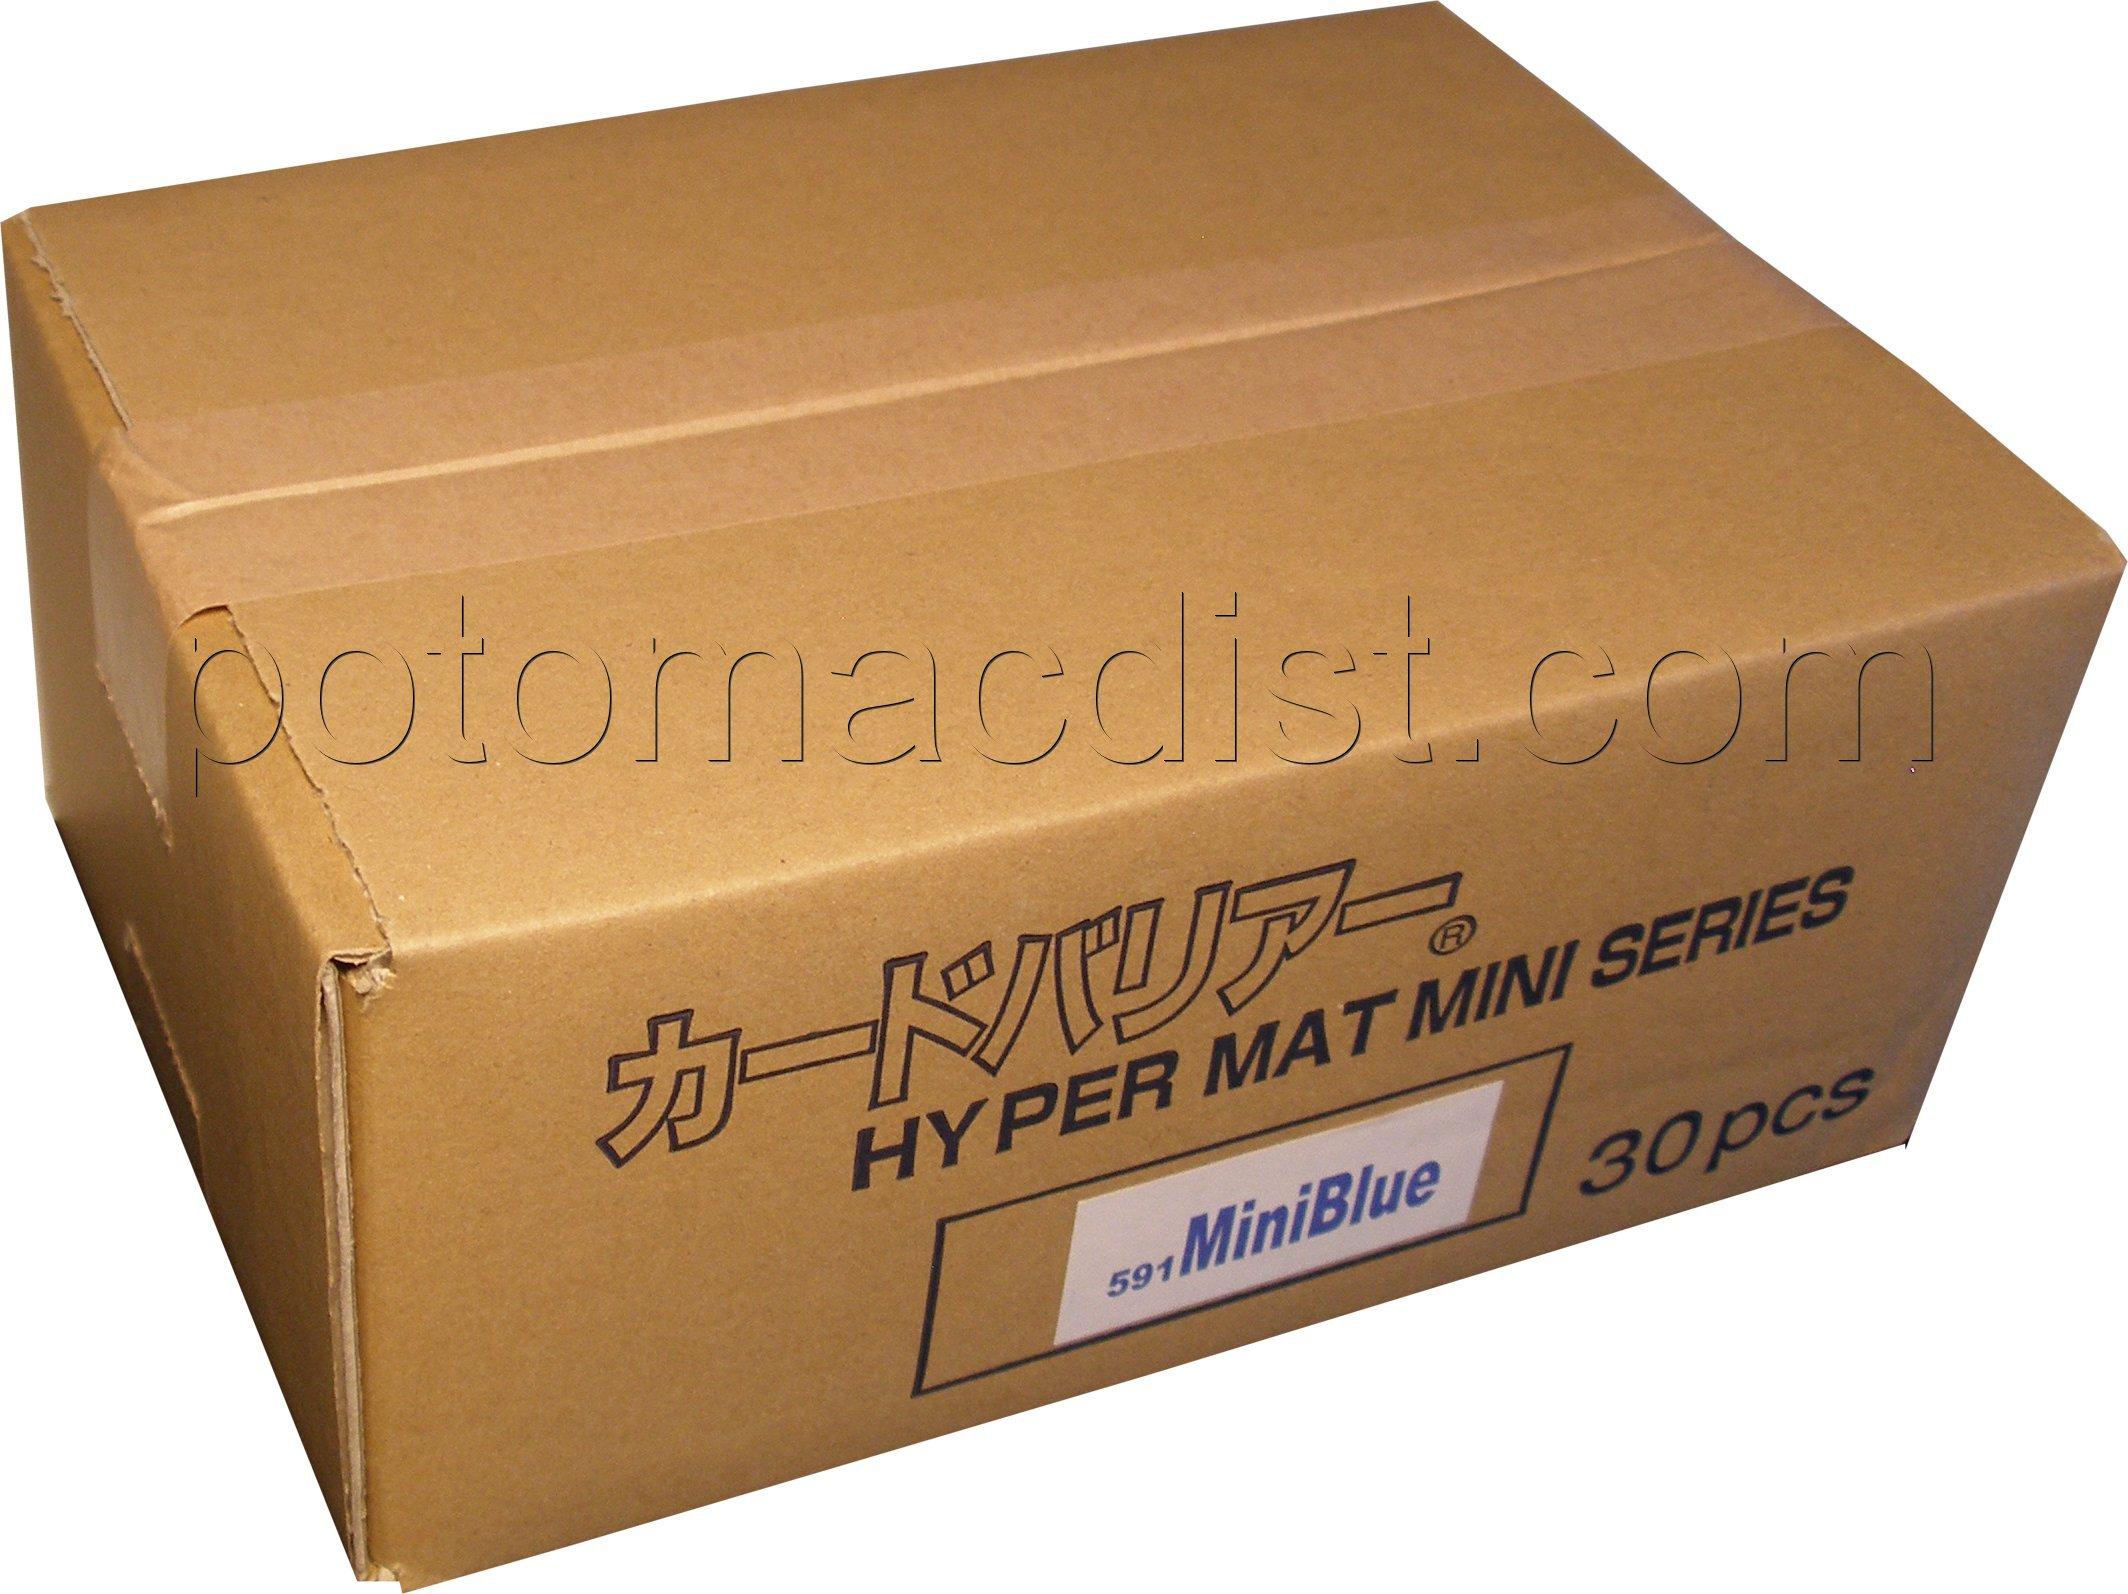 Case Blue Mini Pack : Kmc yugioh sleeves hyper matte blue case[30] potomac distribution